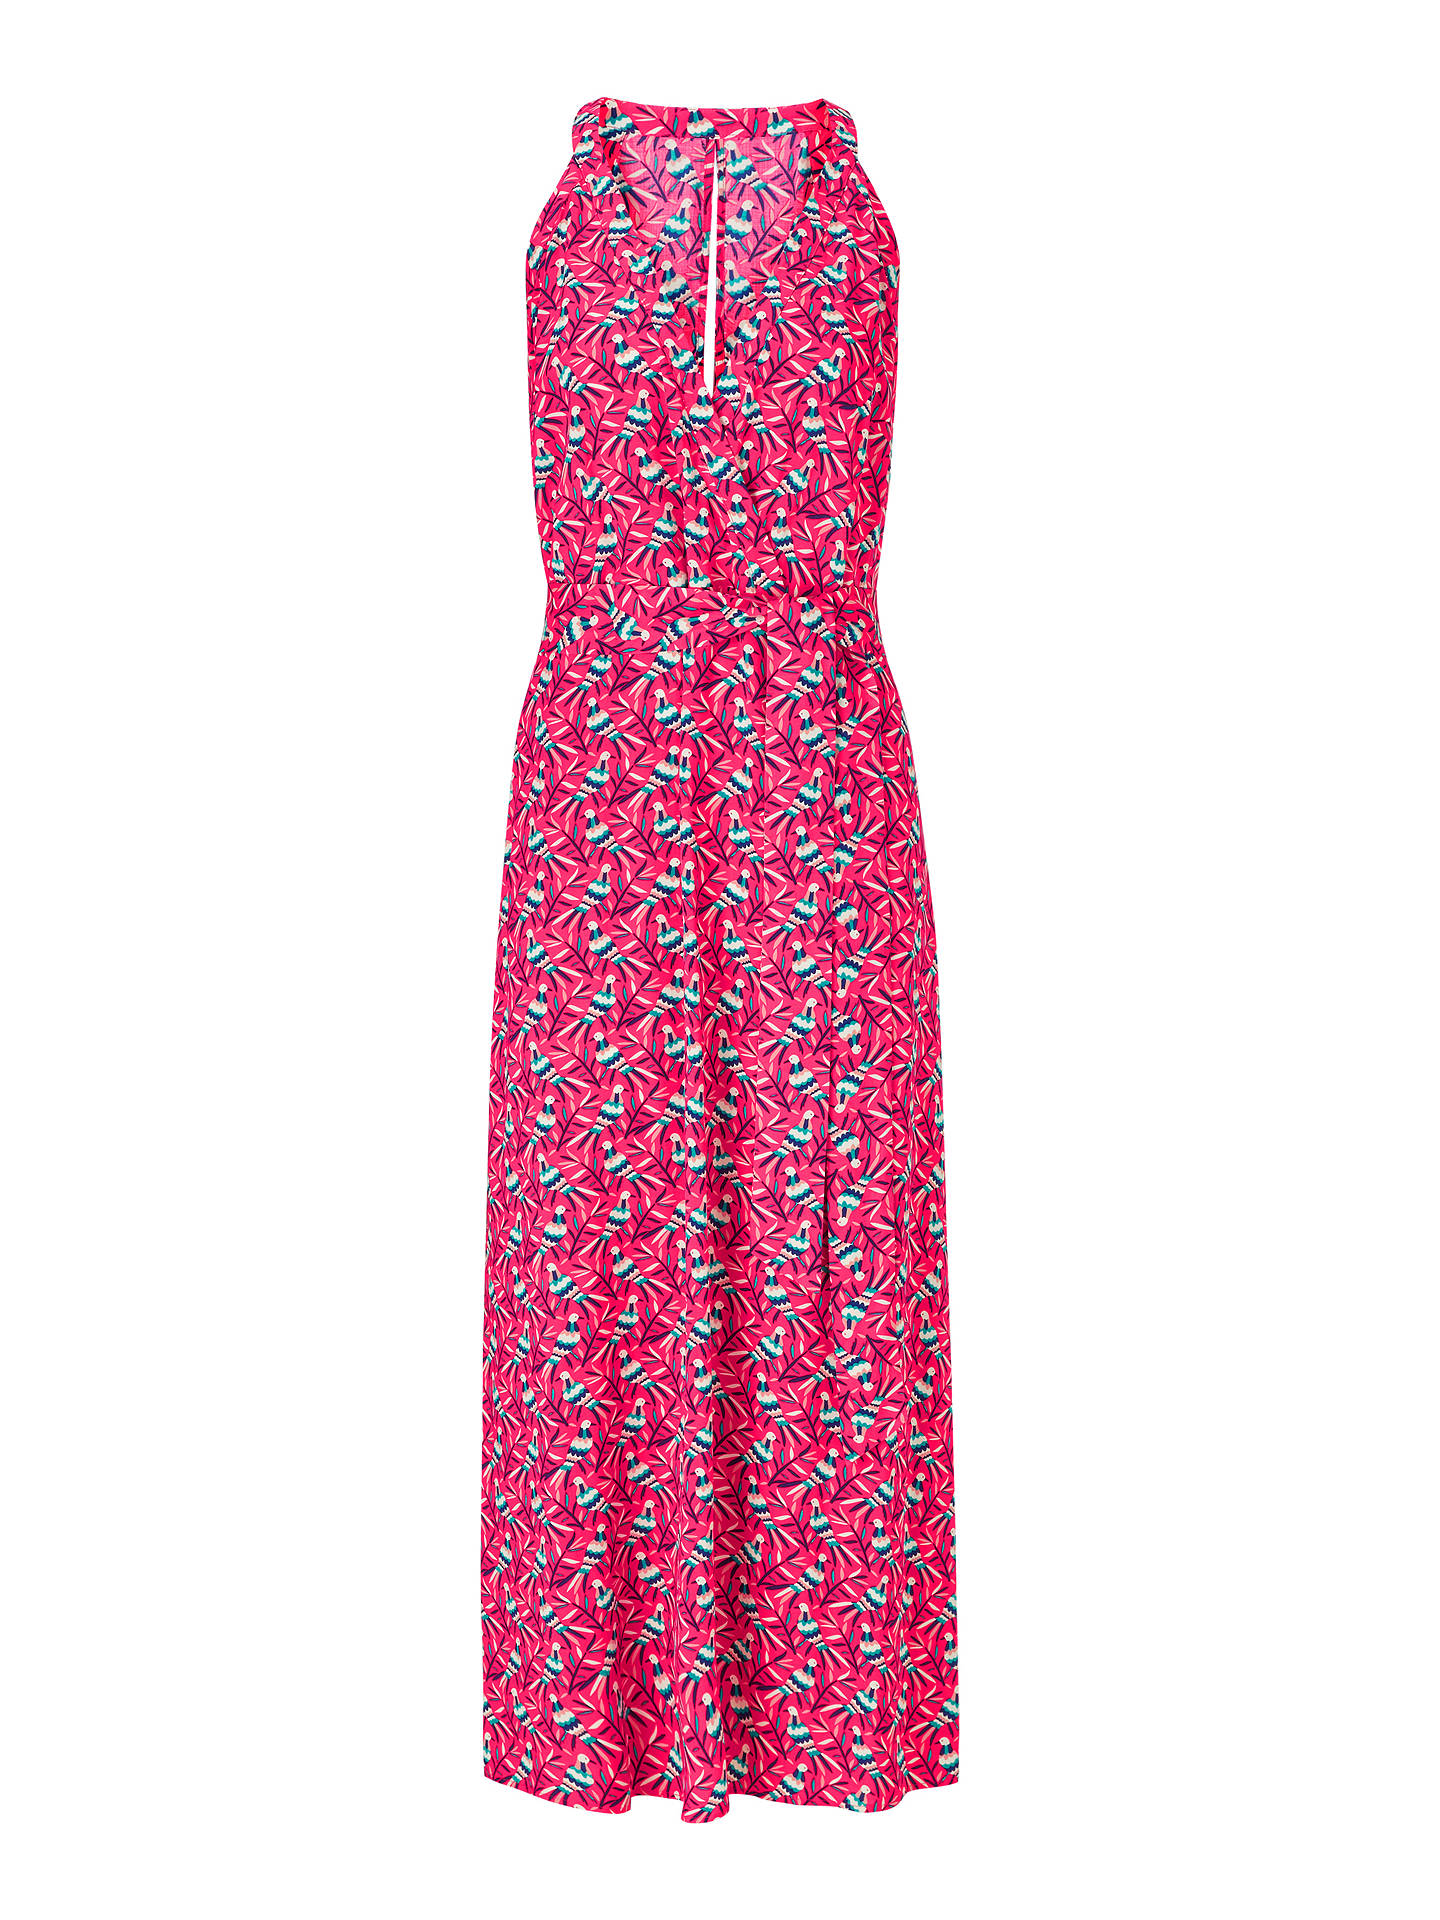 dc6218a8e8e6 ... Buy Boden Olwen Dress, Strawberry Split, 8 Online at johnlewis.com ...